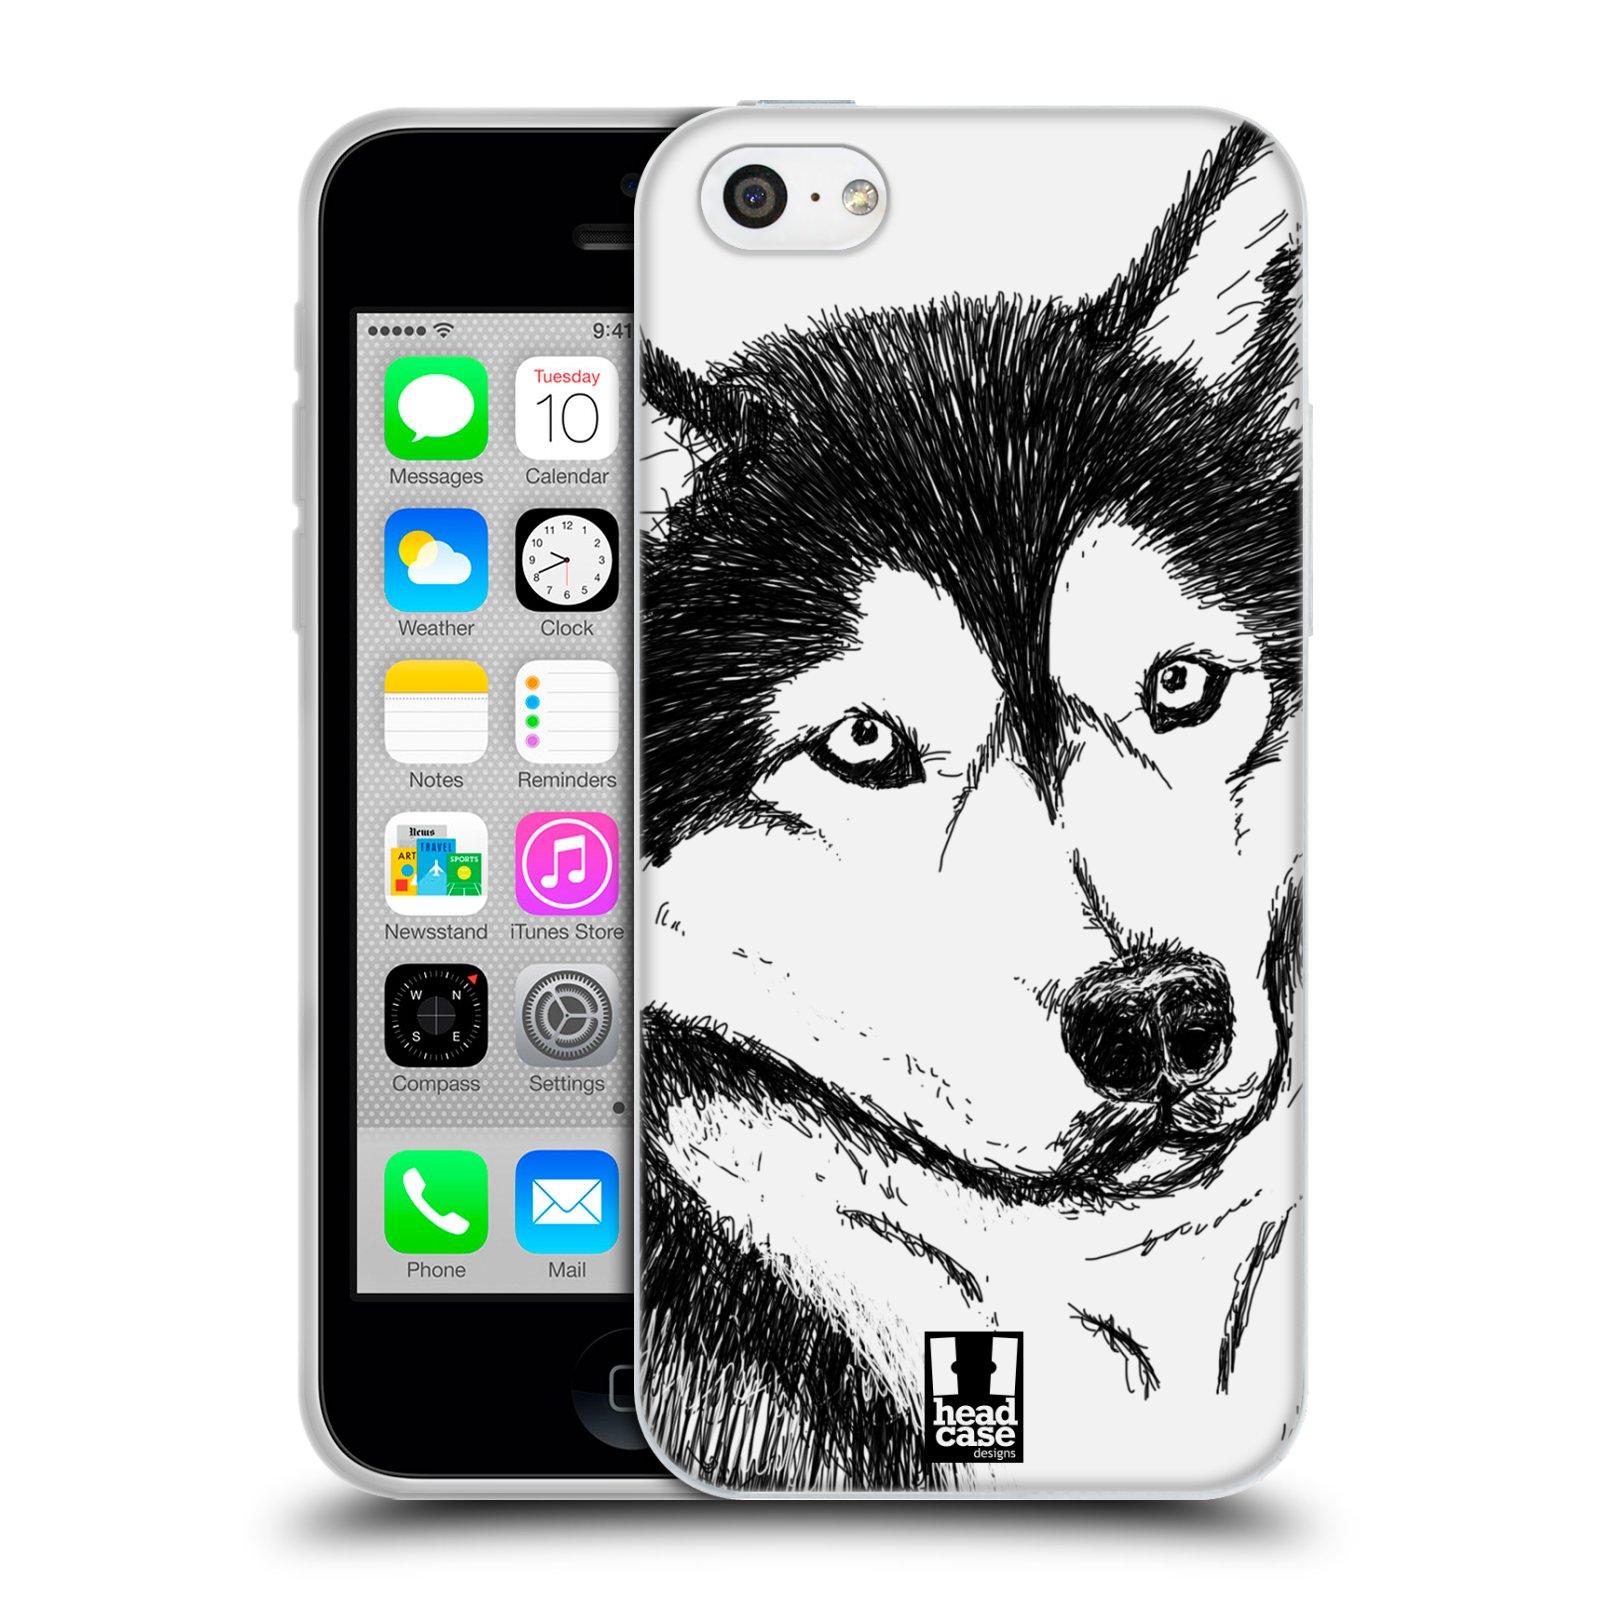 HEAD CASE silikonový obal na mobil Apple Iphone 5C vzor Kreslená zvířátka černá a bílá pes husky